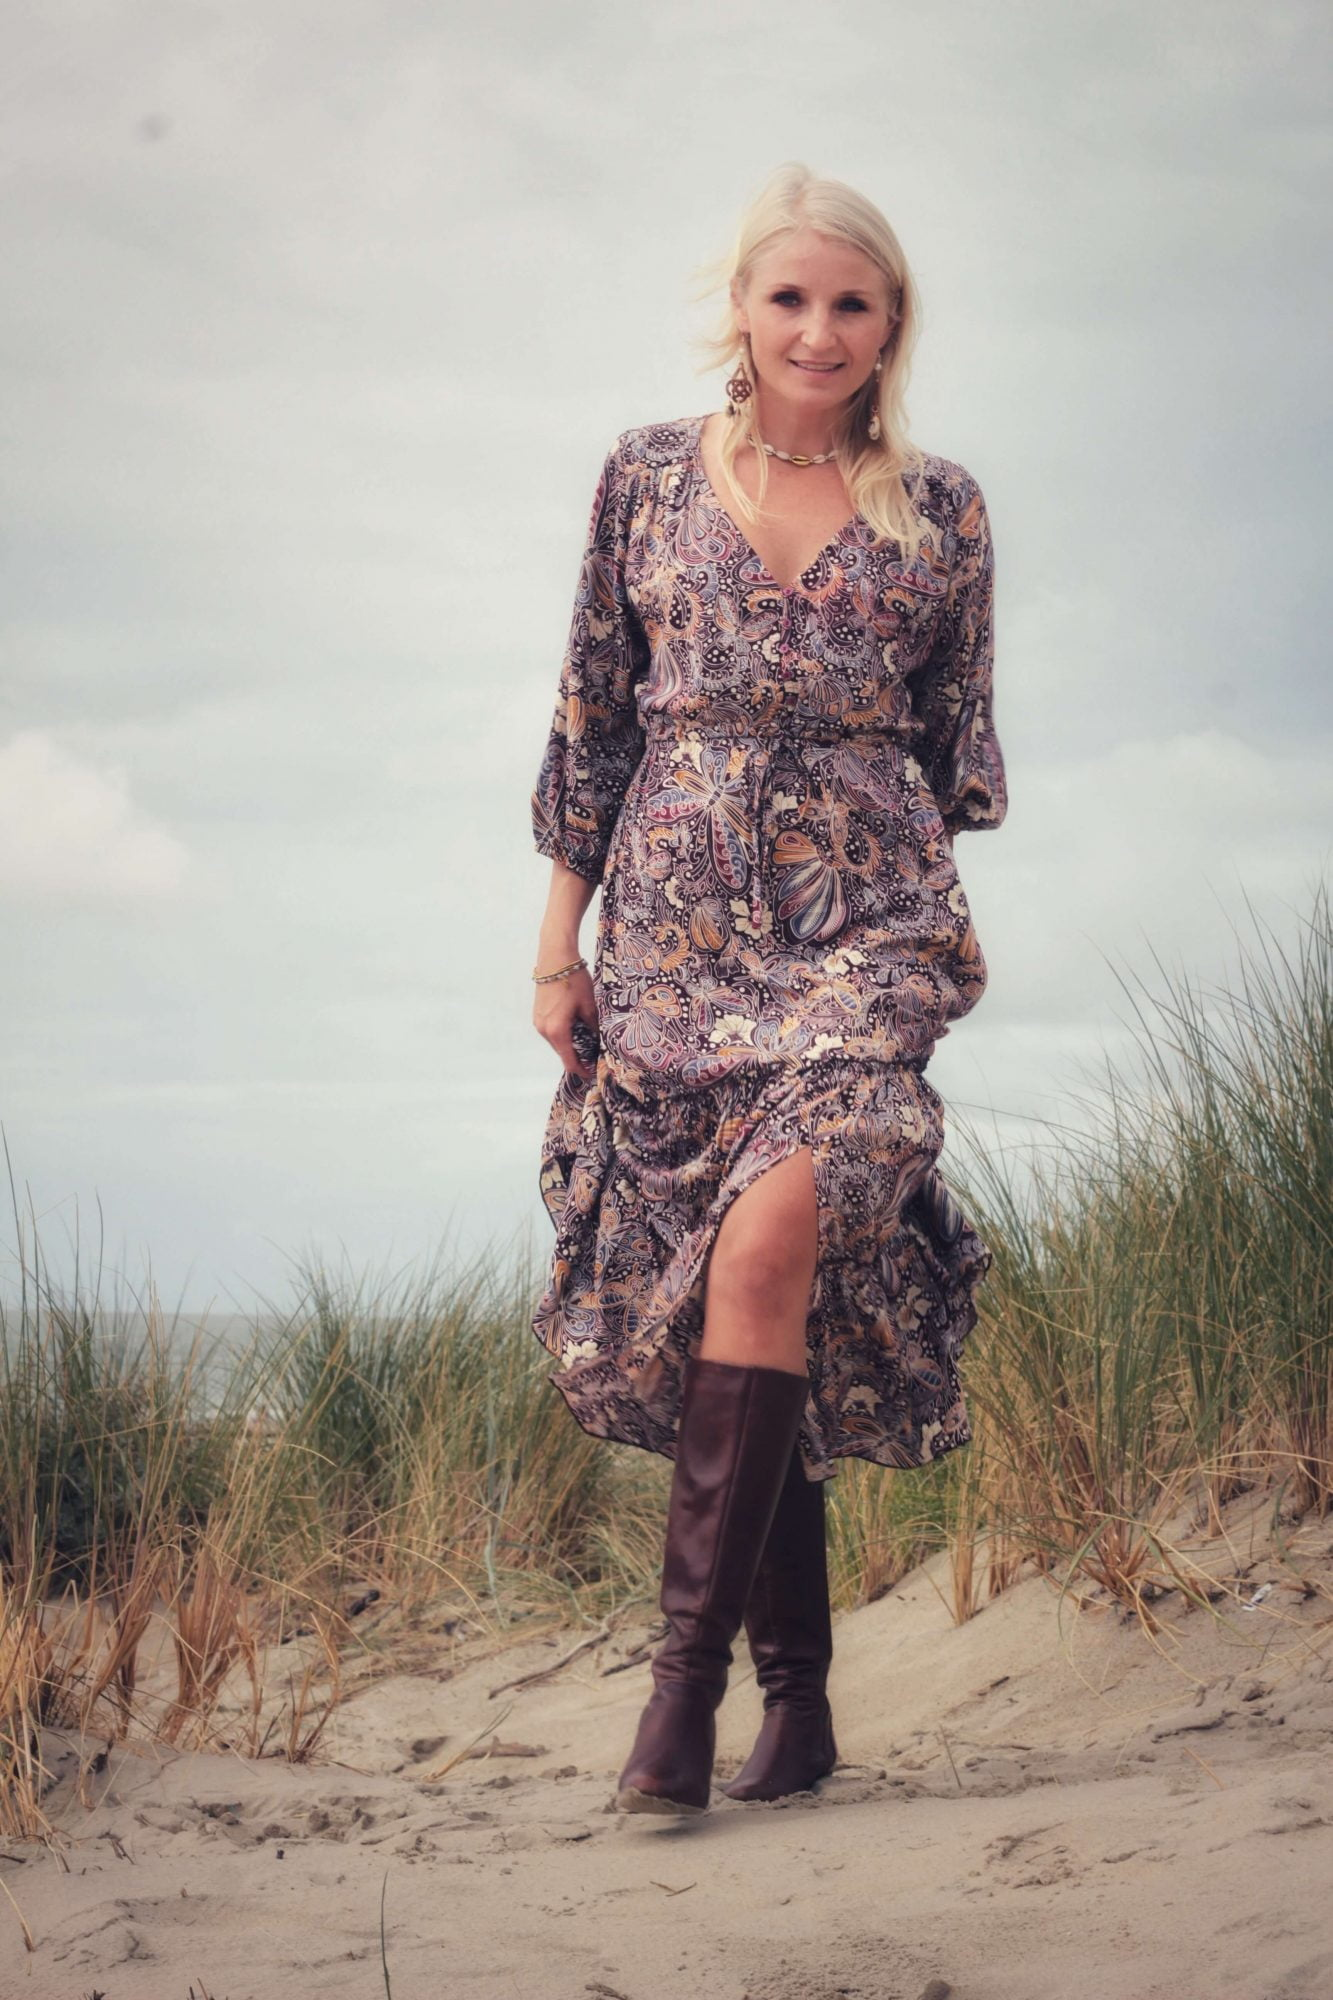 Boho Chic Midikleid Herbst Winter Bohemian Style Kleidung